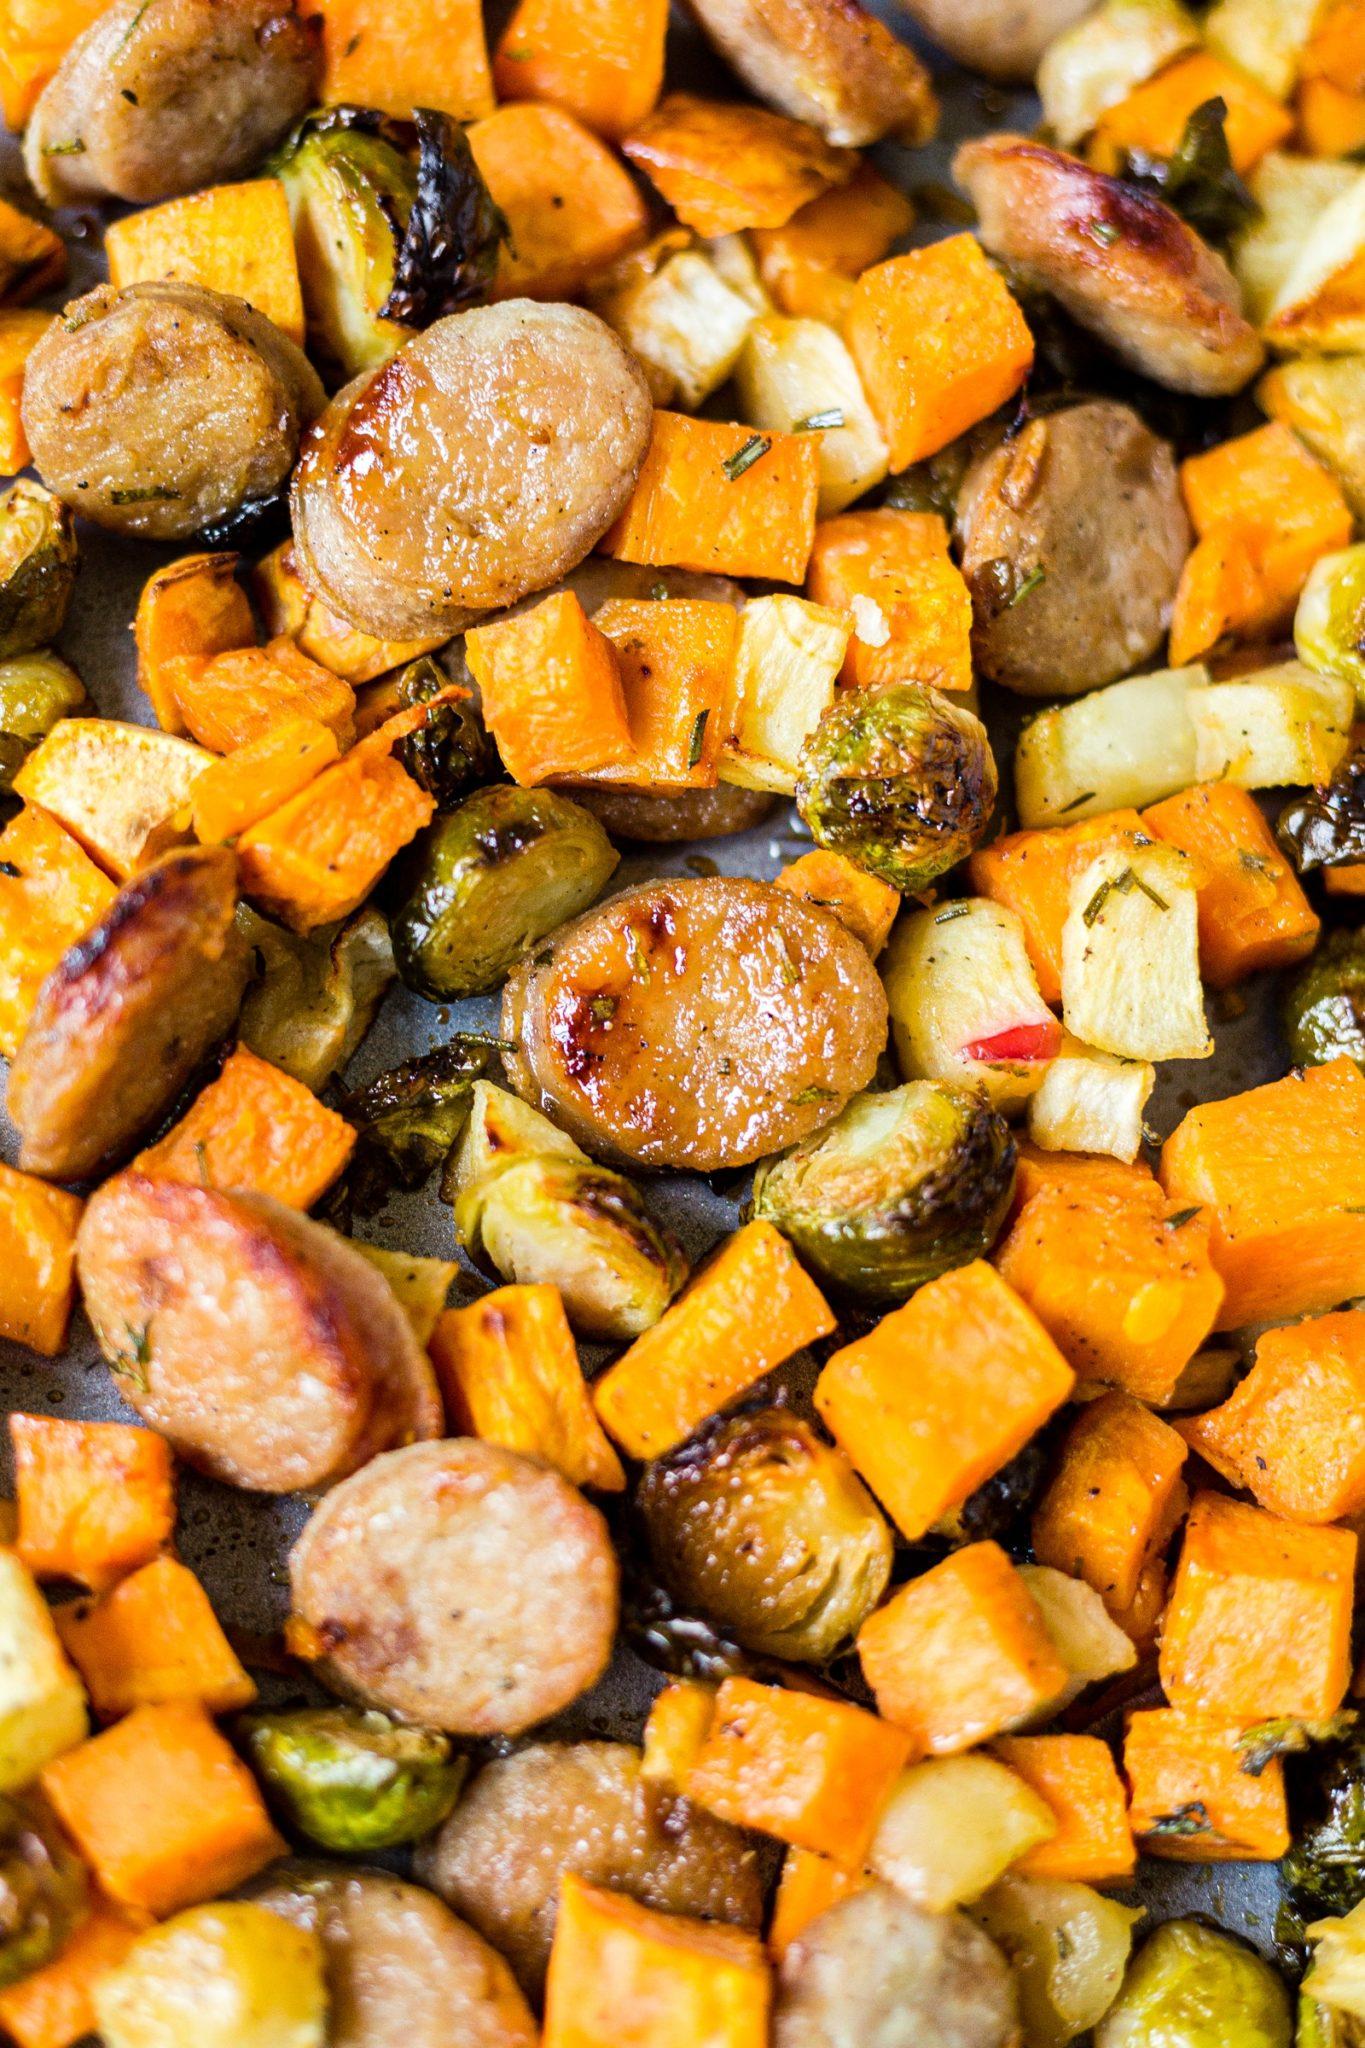 maple dijon sausage and veggies on a sheet pan